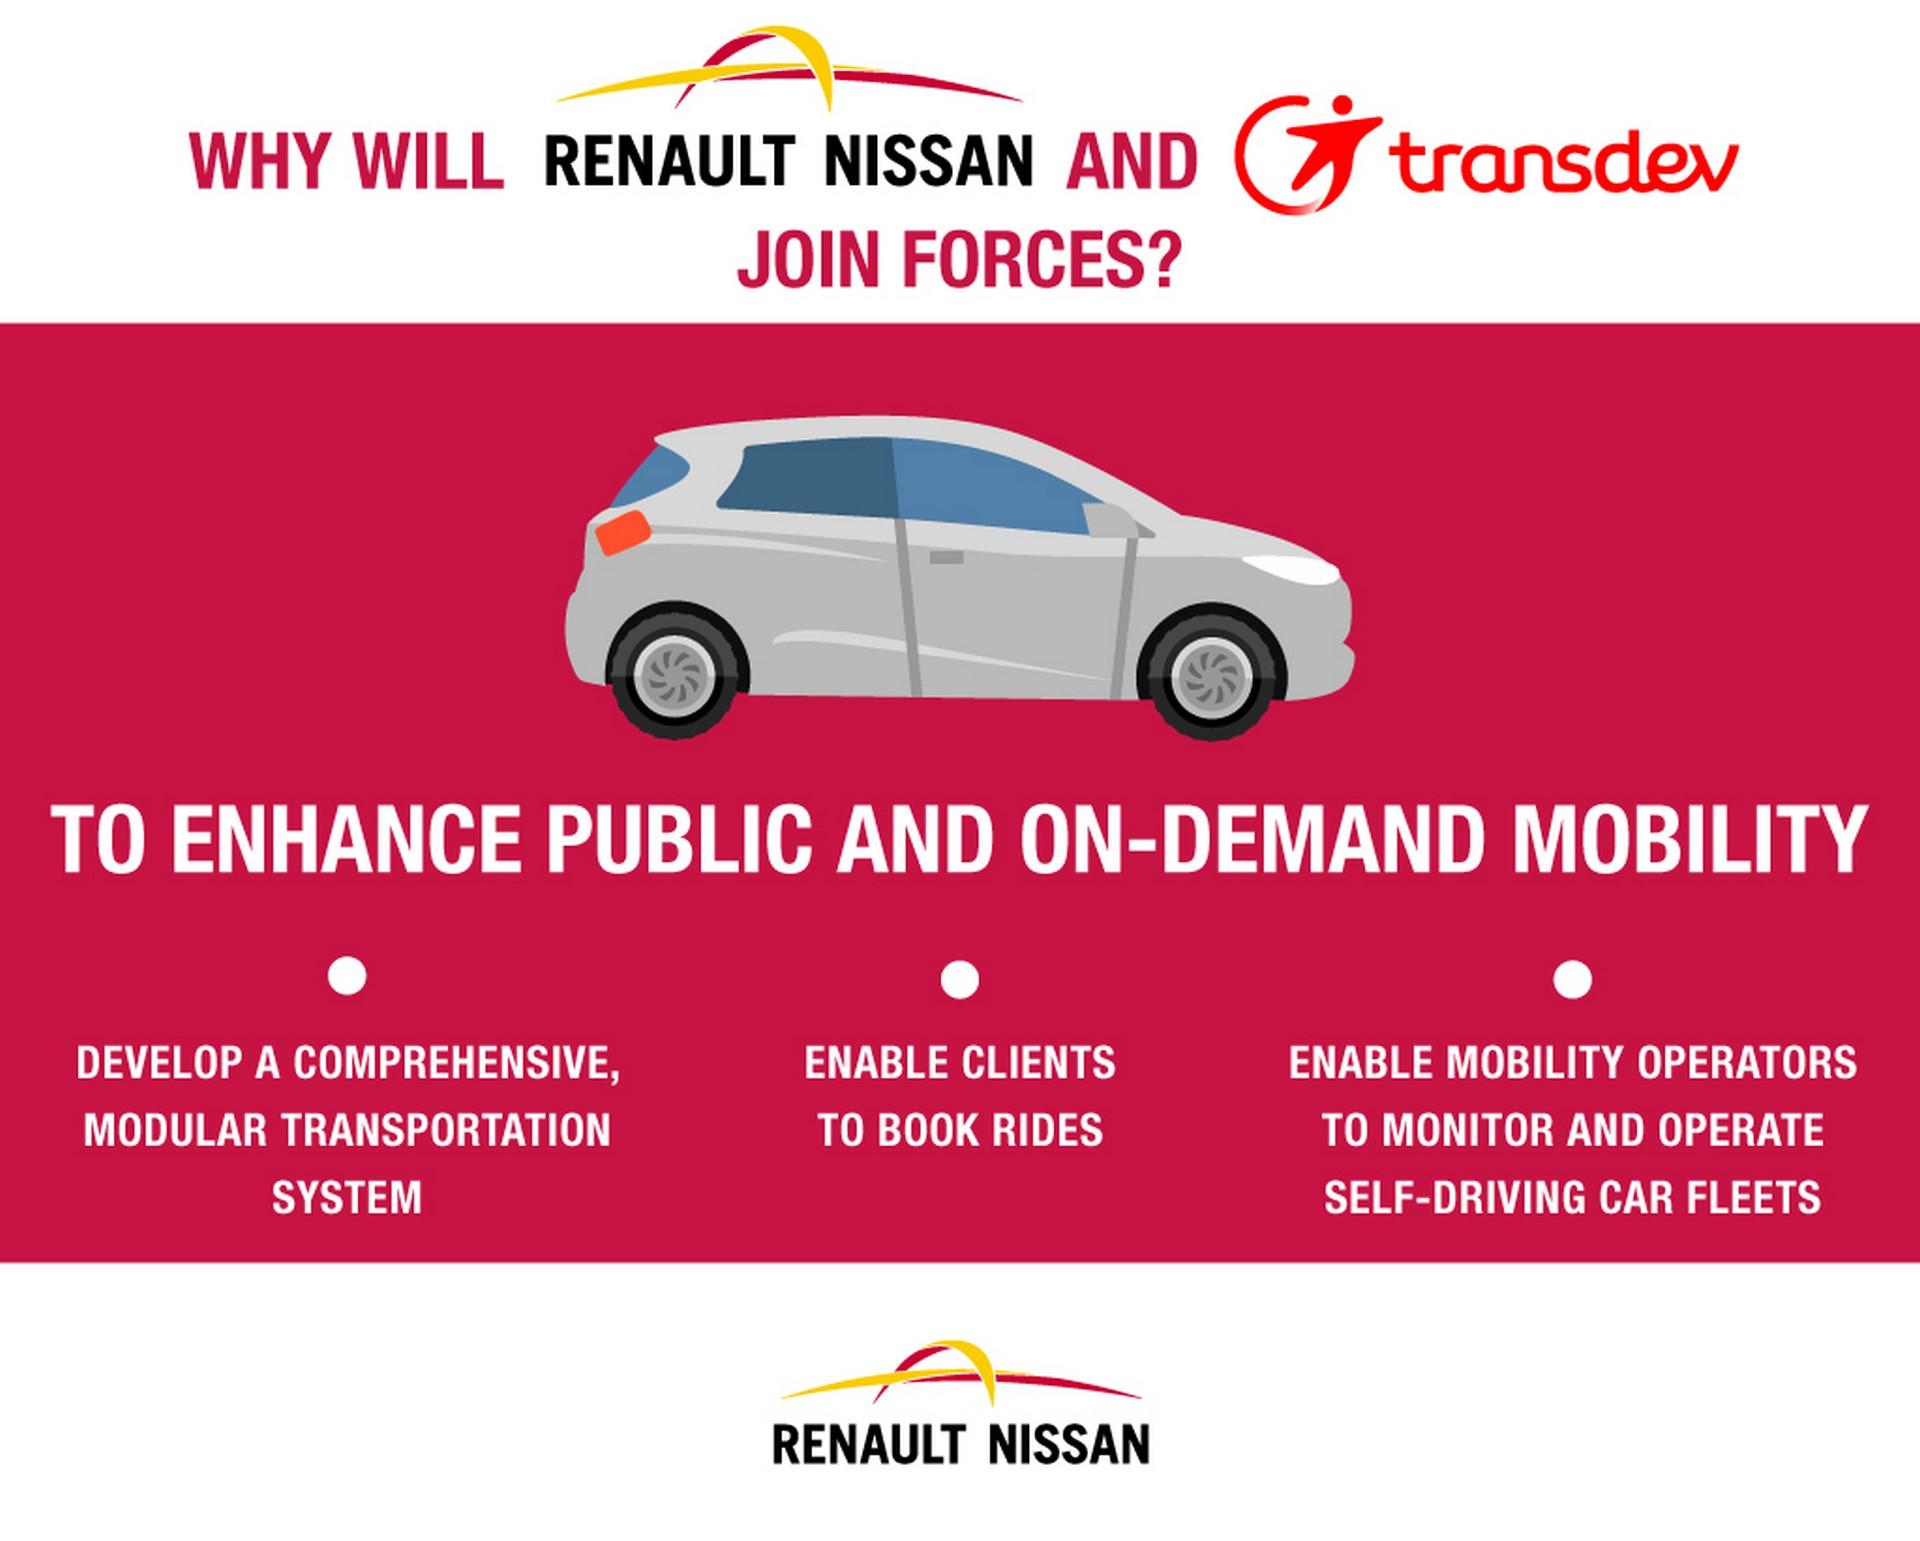 Renault Nissan Alliance Transdev partnership 2